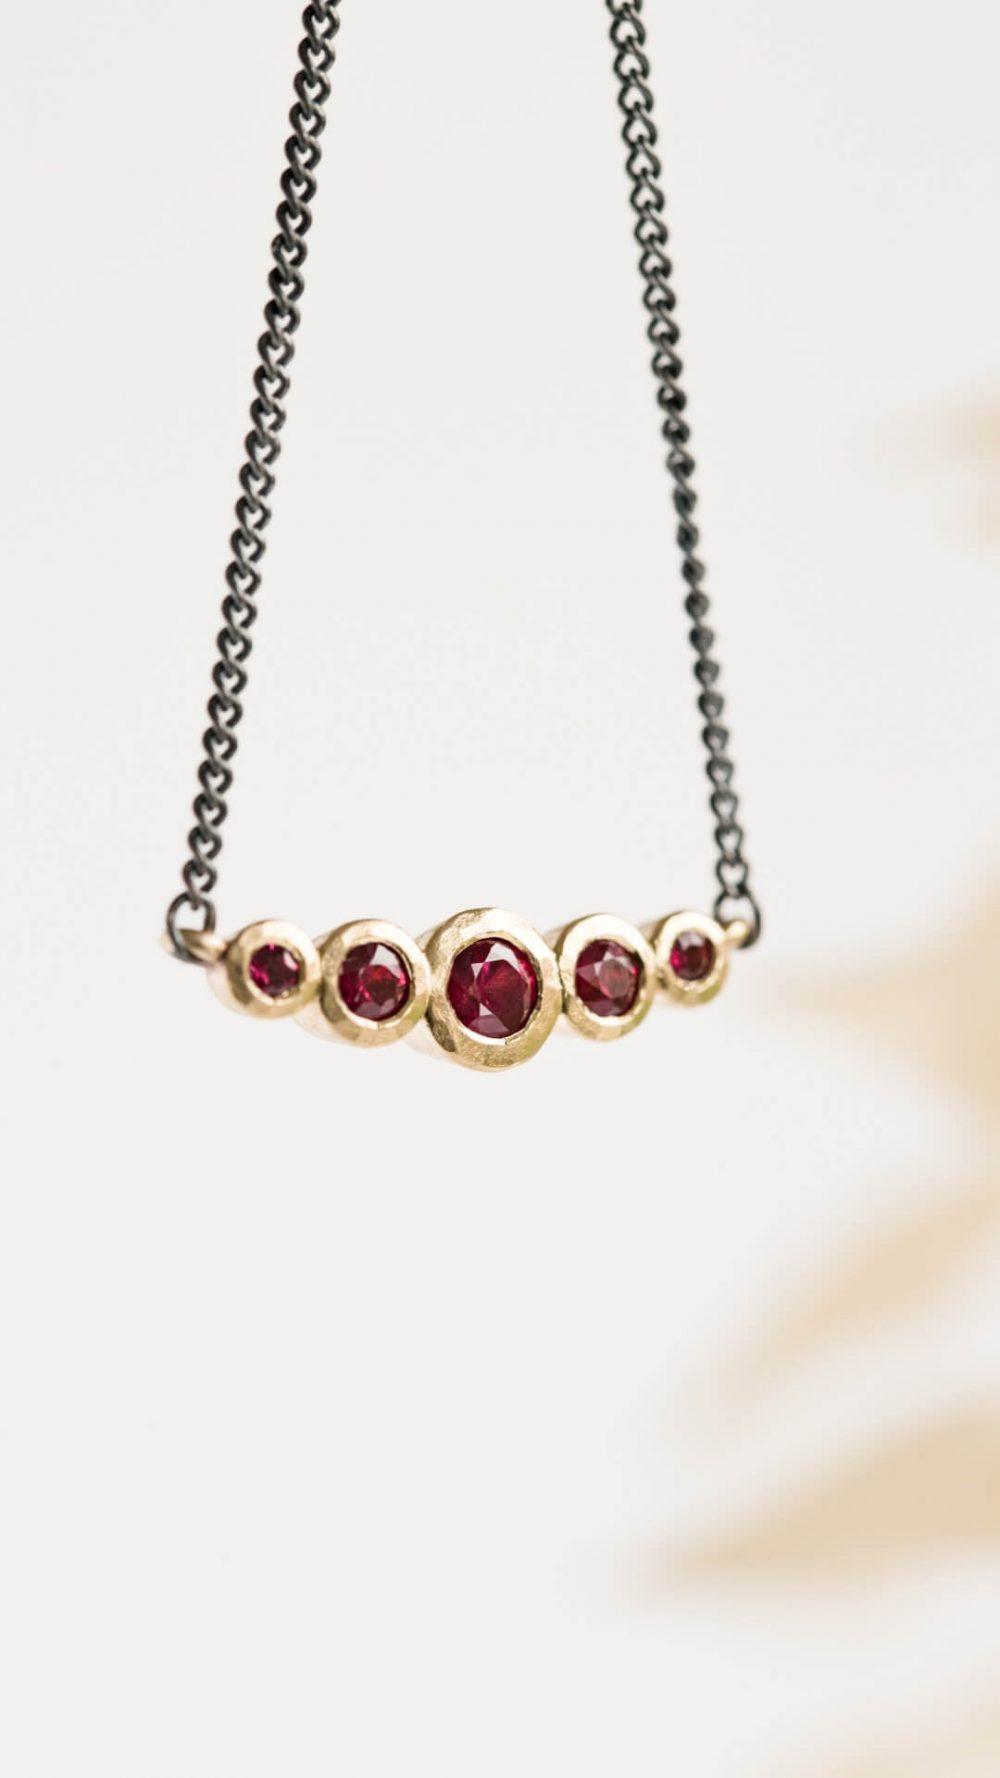 Gold Ruby Necklace 3 Oxidised Silver Chain Jacks Turner Jewellery Bristol